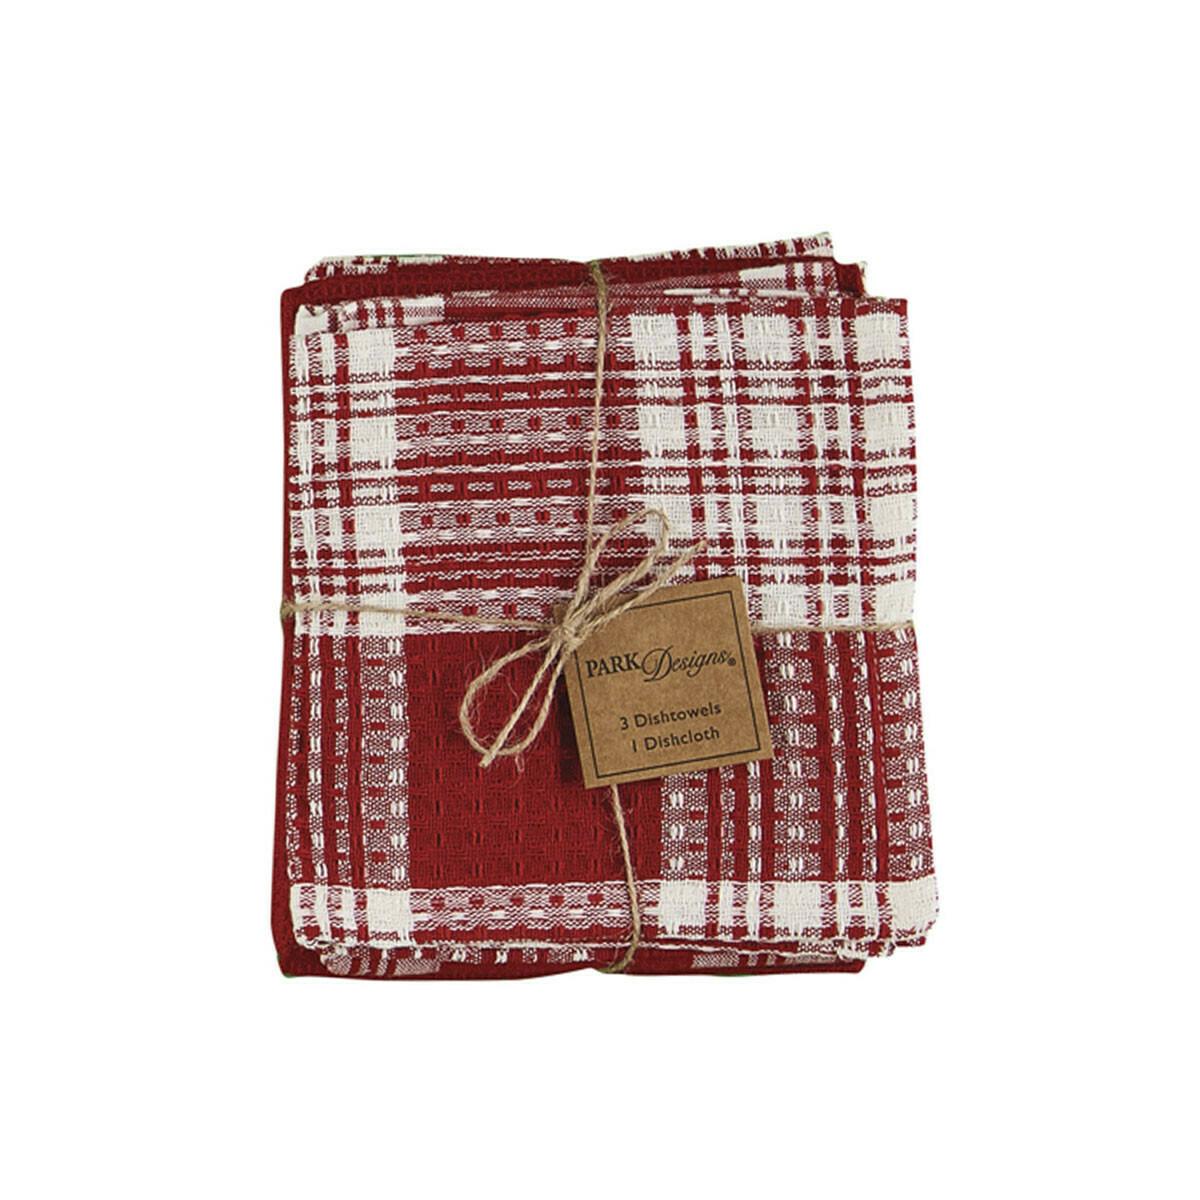 Red Dylan 3 Dishtowel & 1 Dishcloth Set